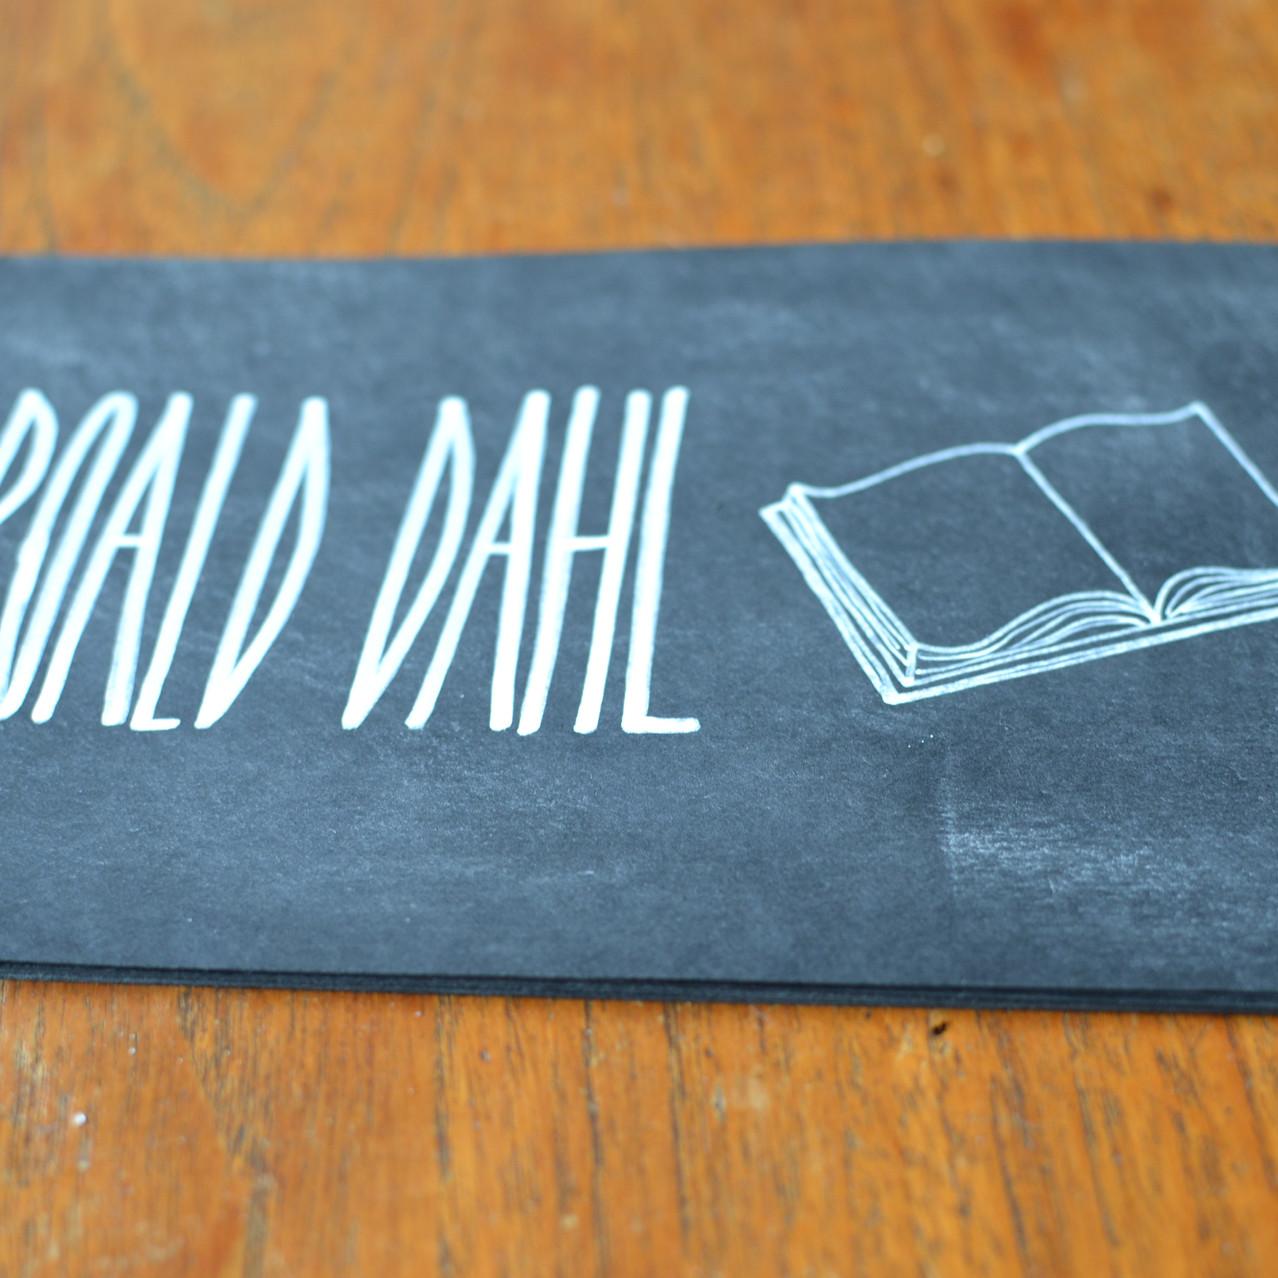 Chalkboard table number signs - Emm7